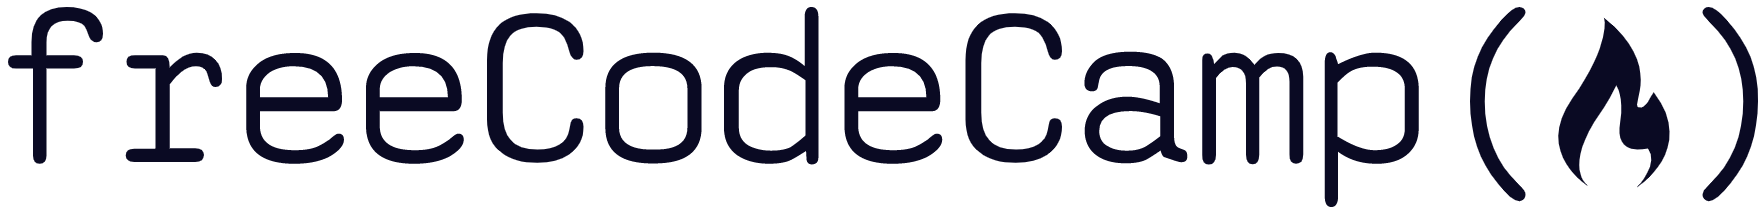 freeCodeCamp.org